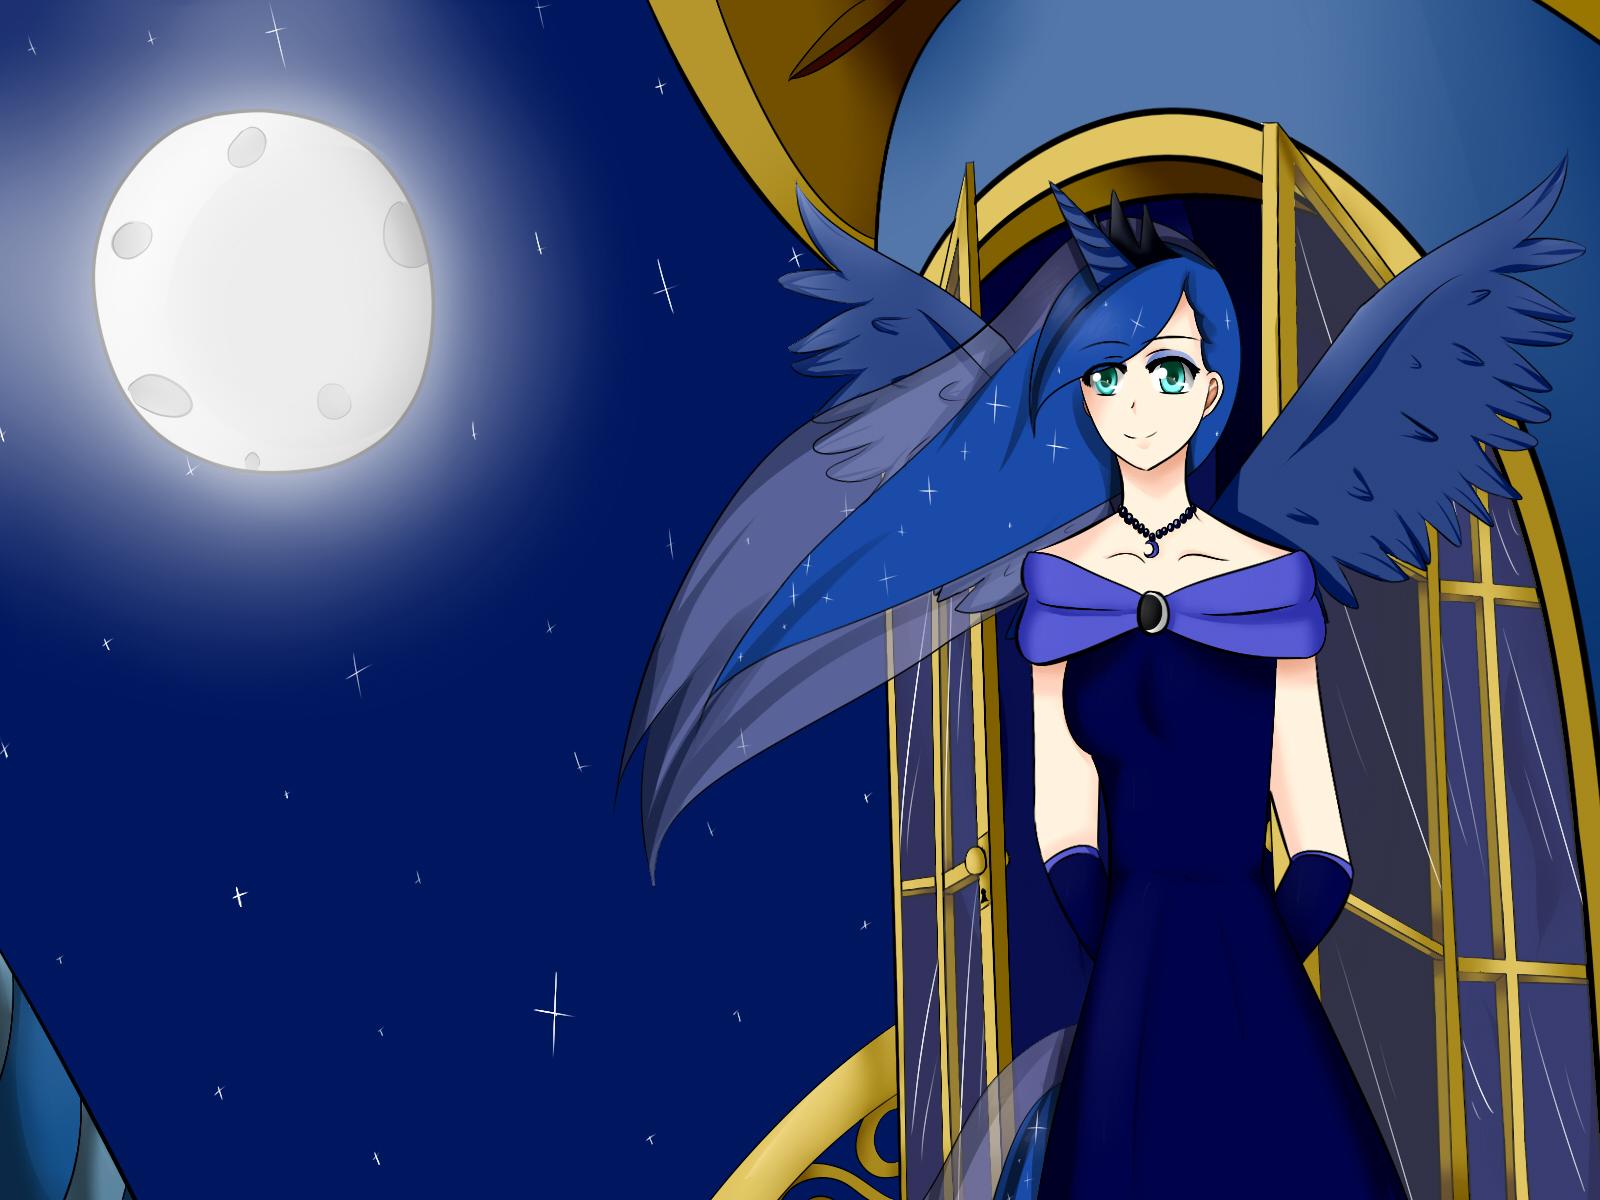 Princess Luna (Human form) (MLP) by Luchsx3 on DeviantArt